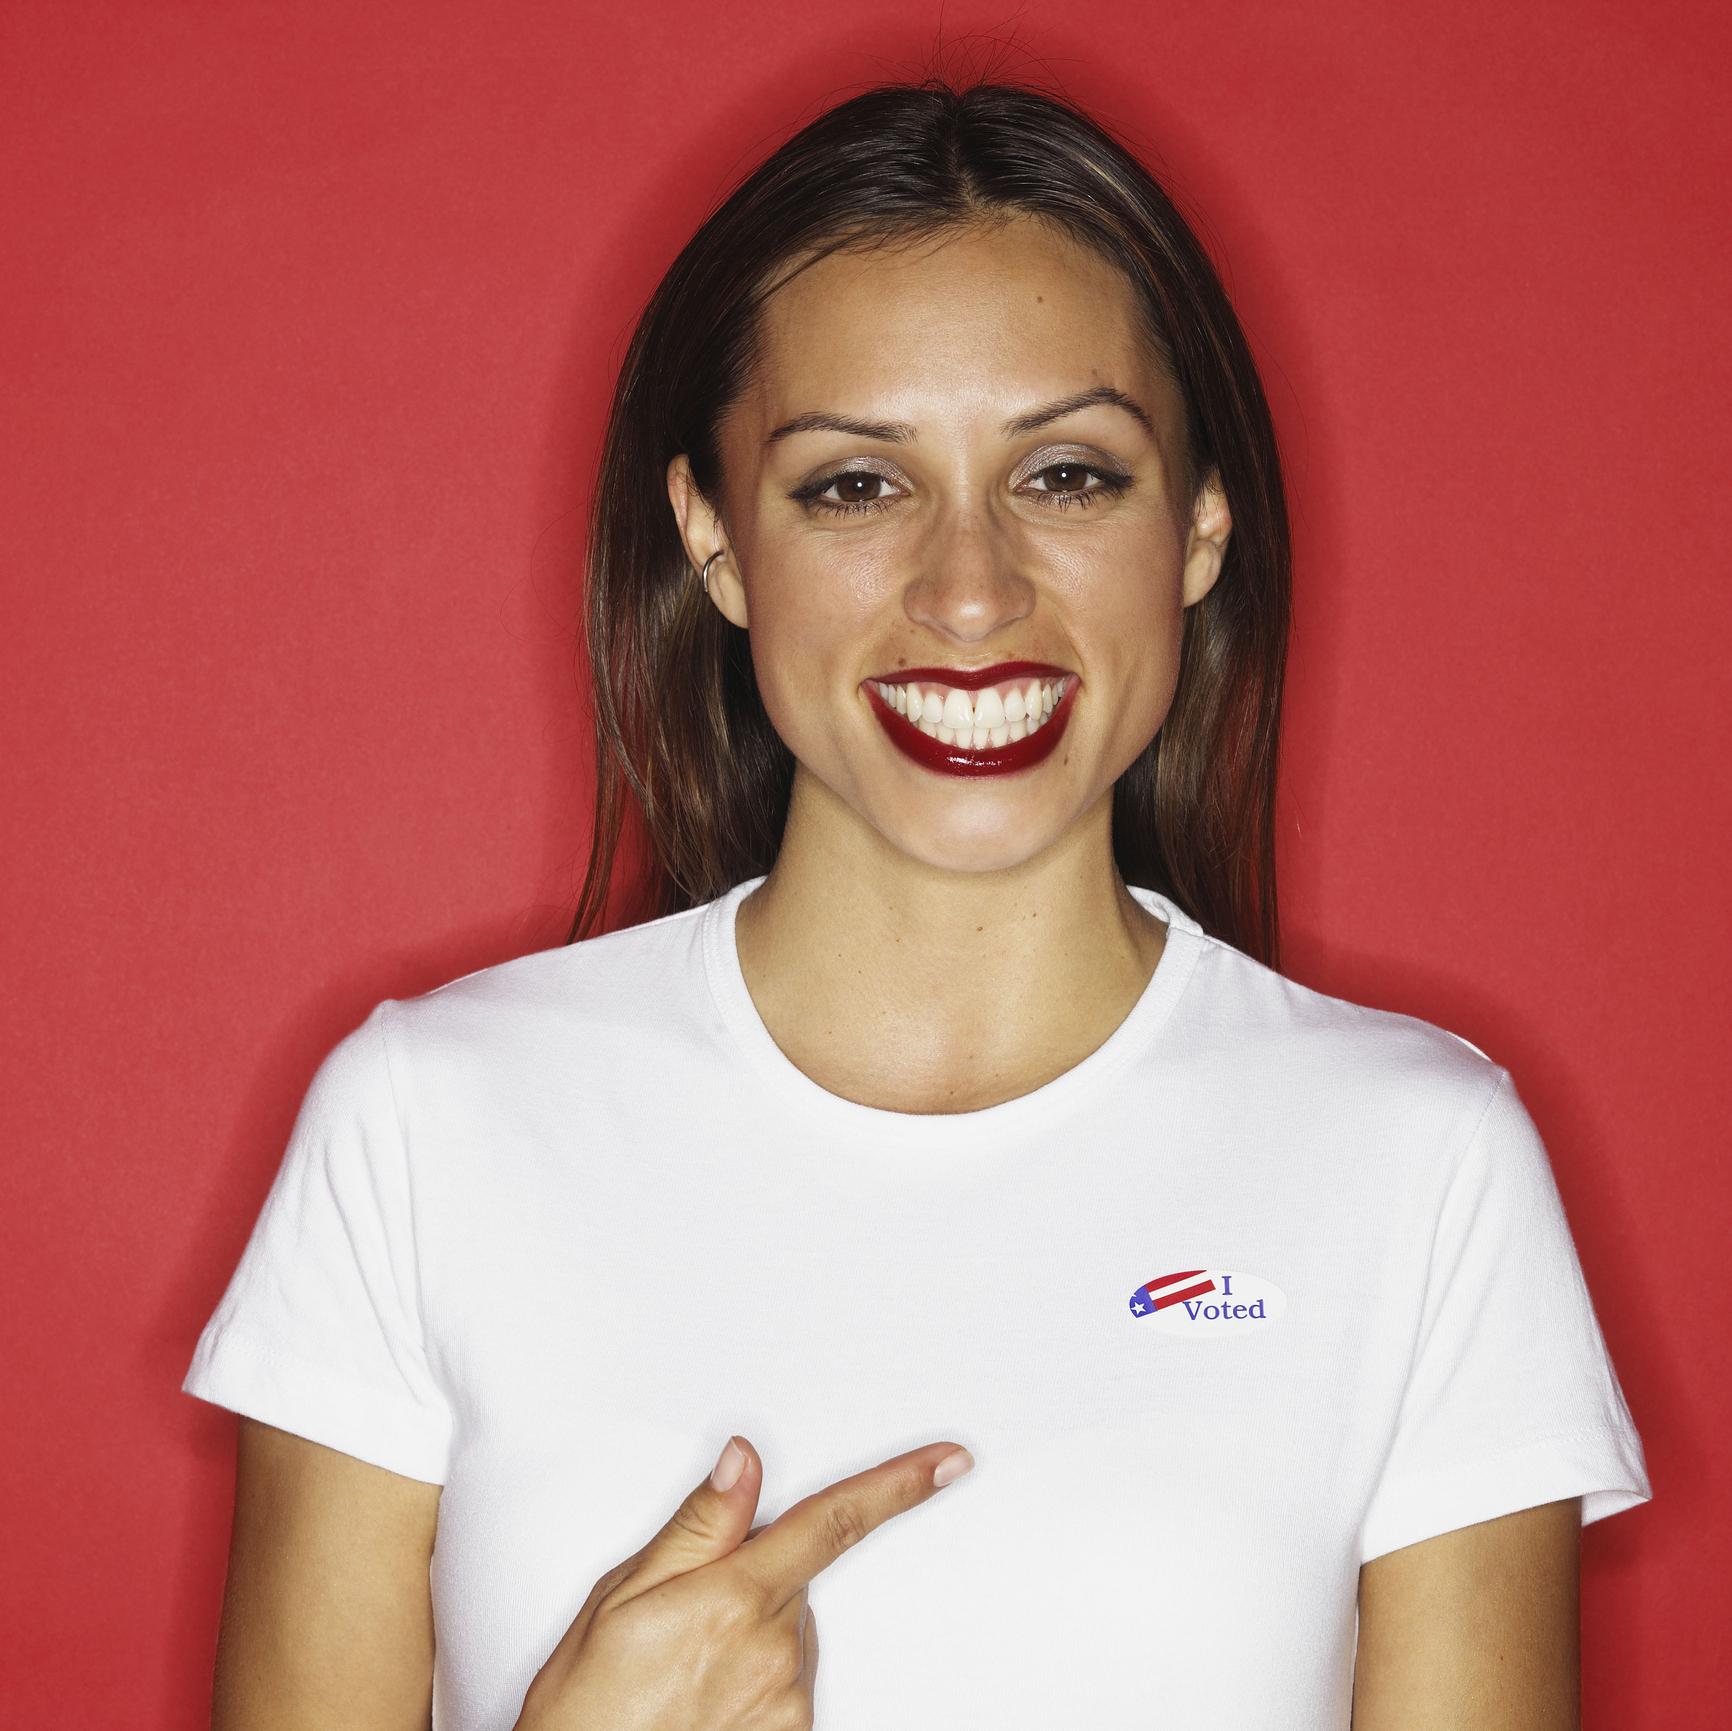 Proud voter